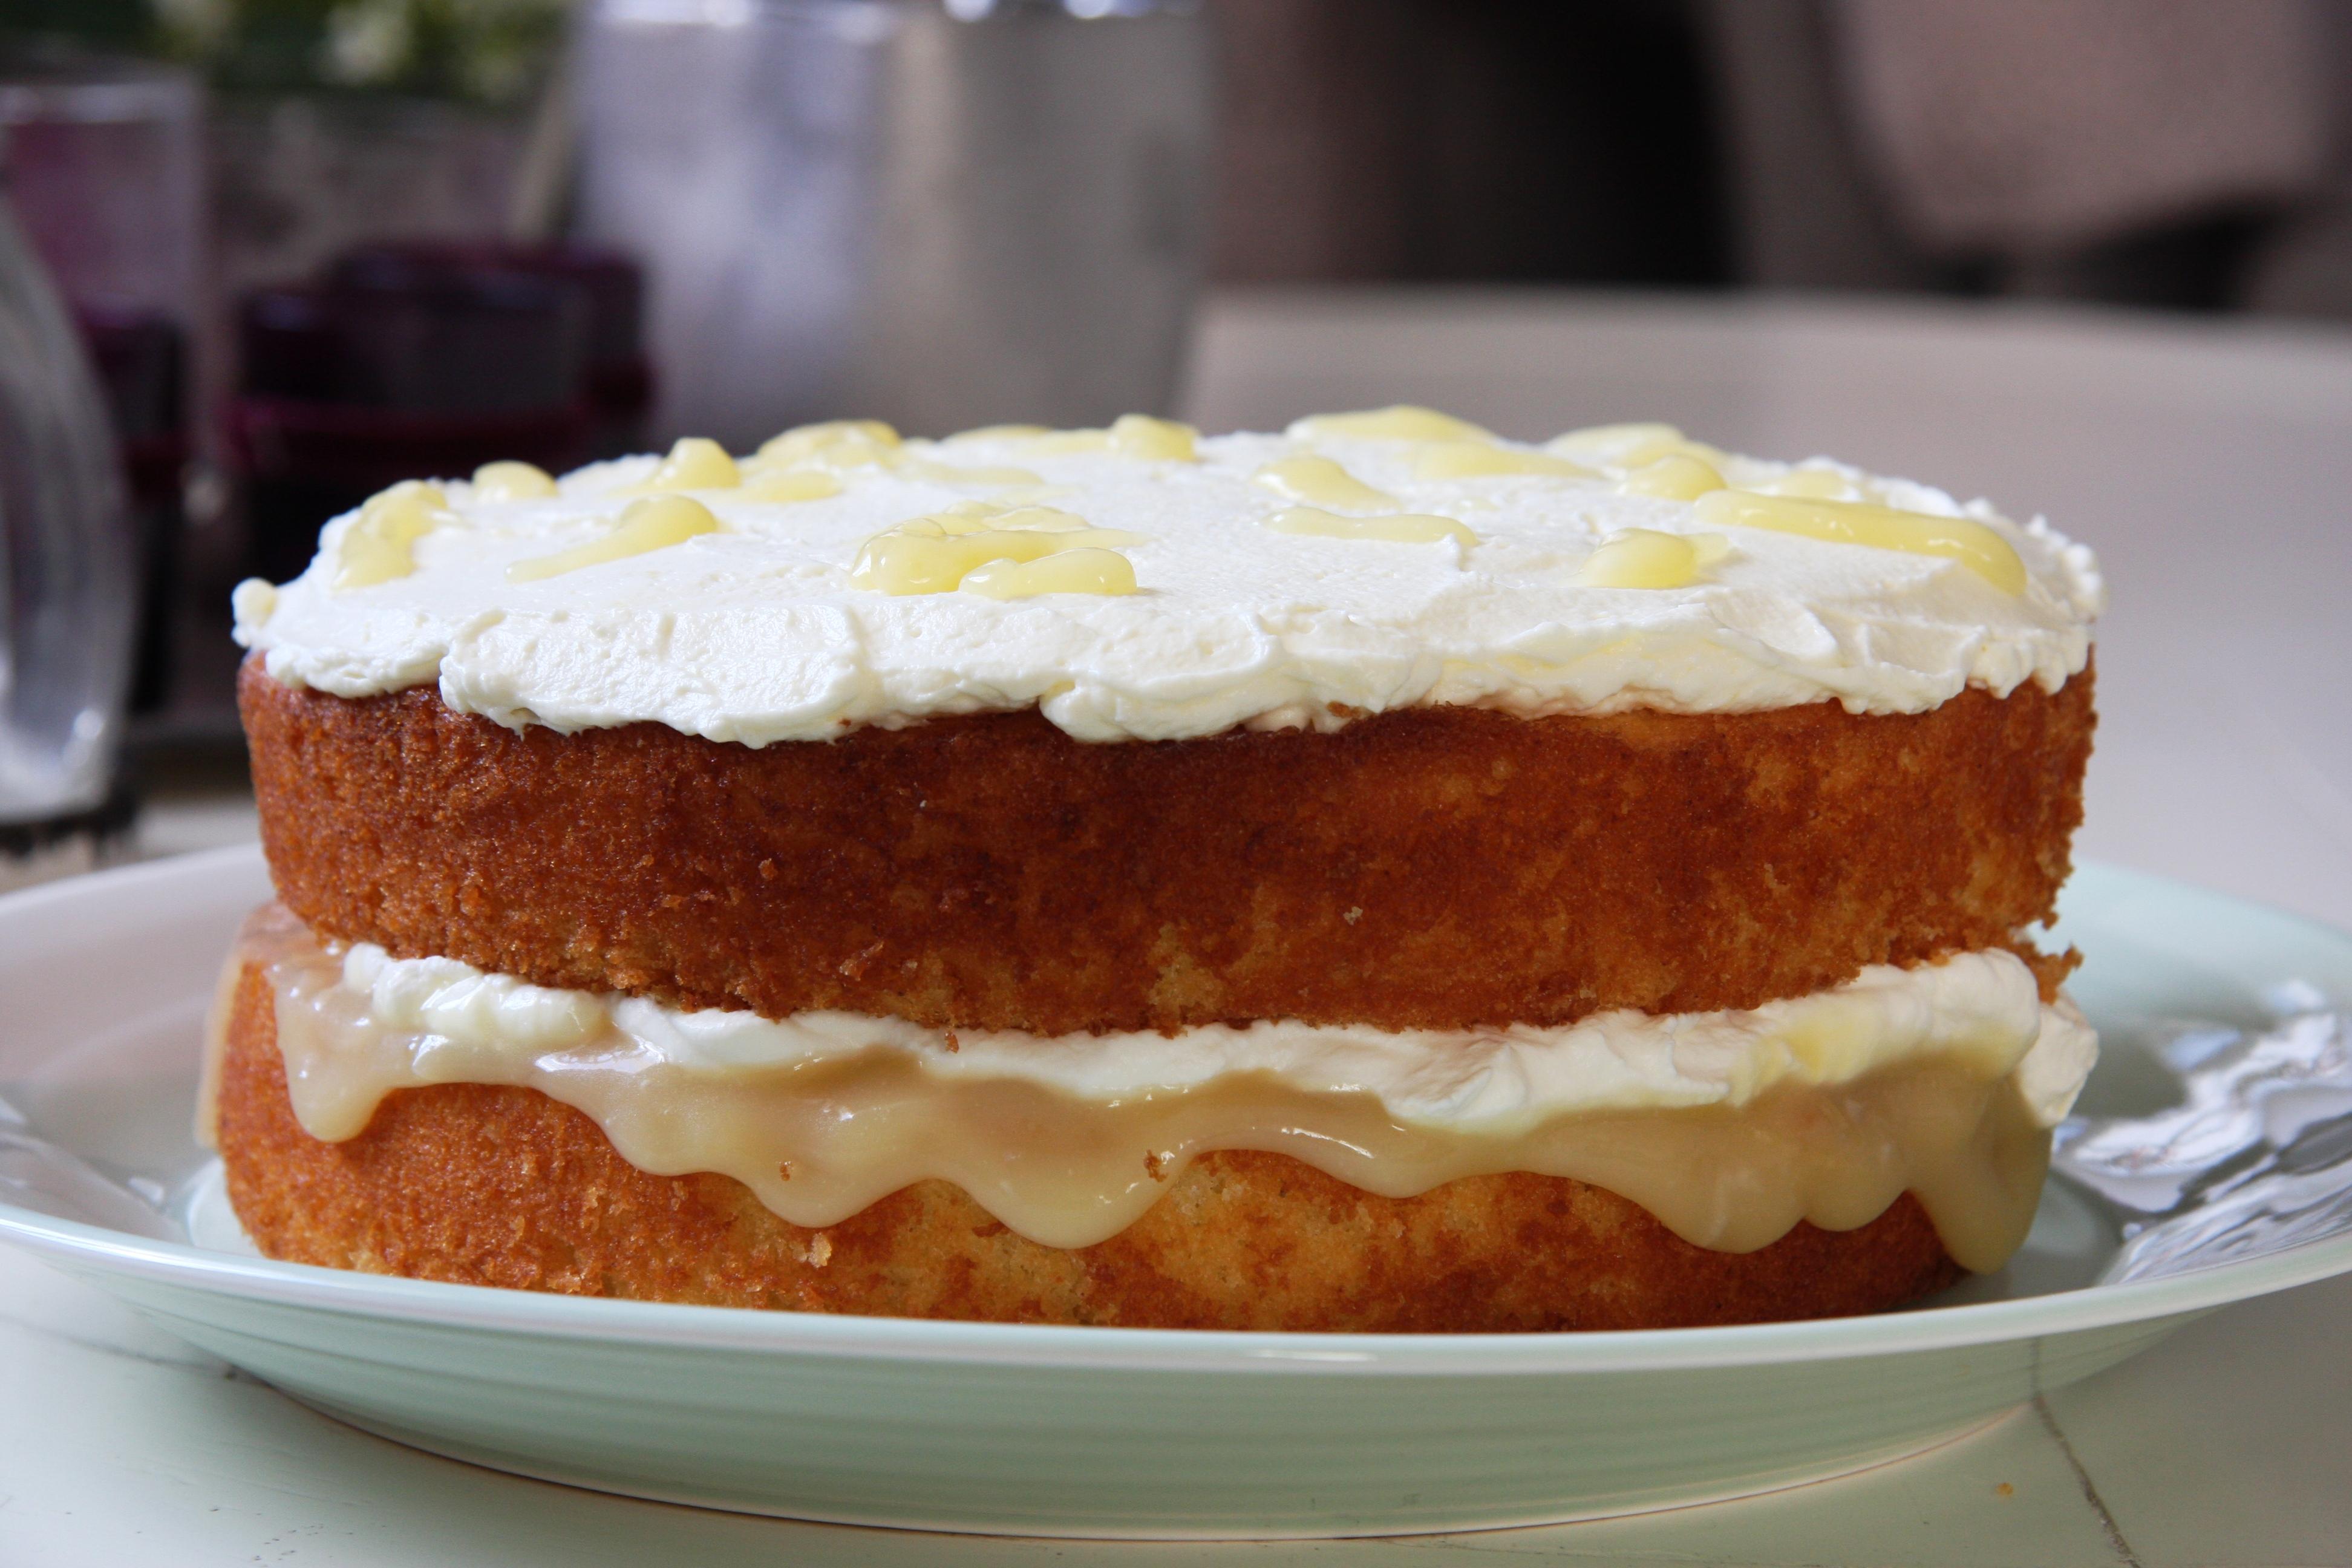 Cake Recipe With Lemon Curd: Lemon Curd Sponge Cake